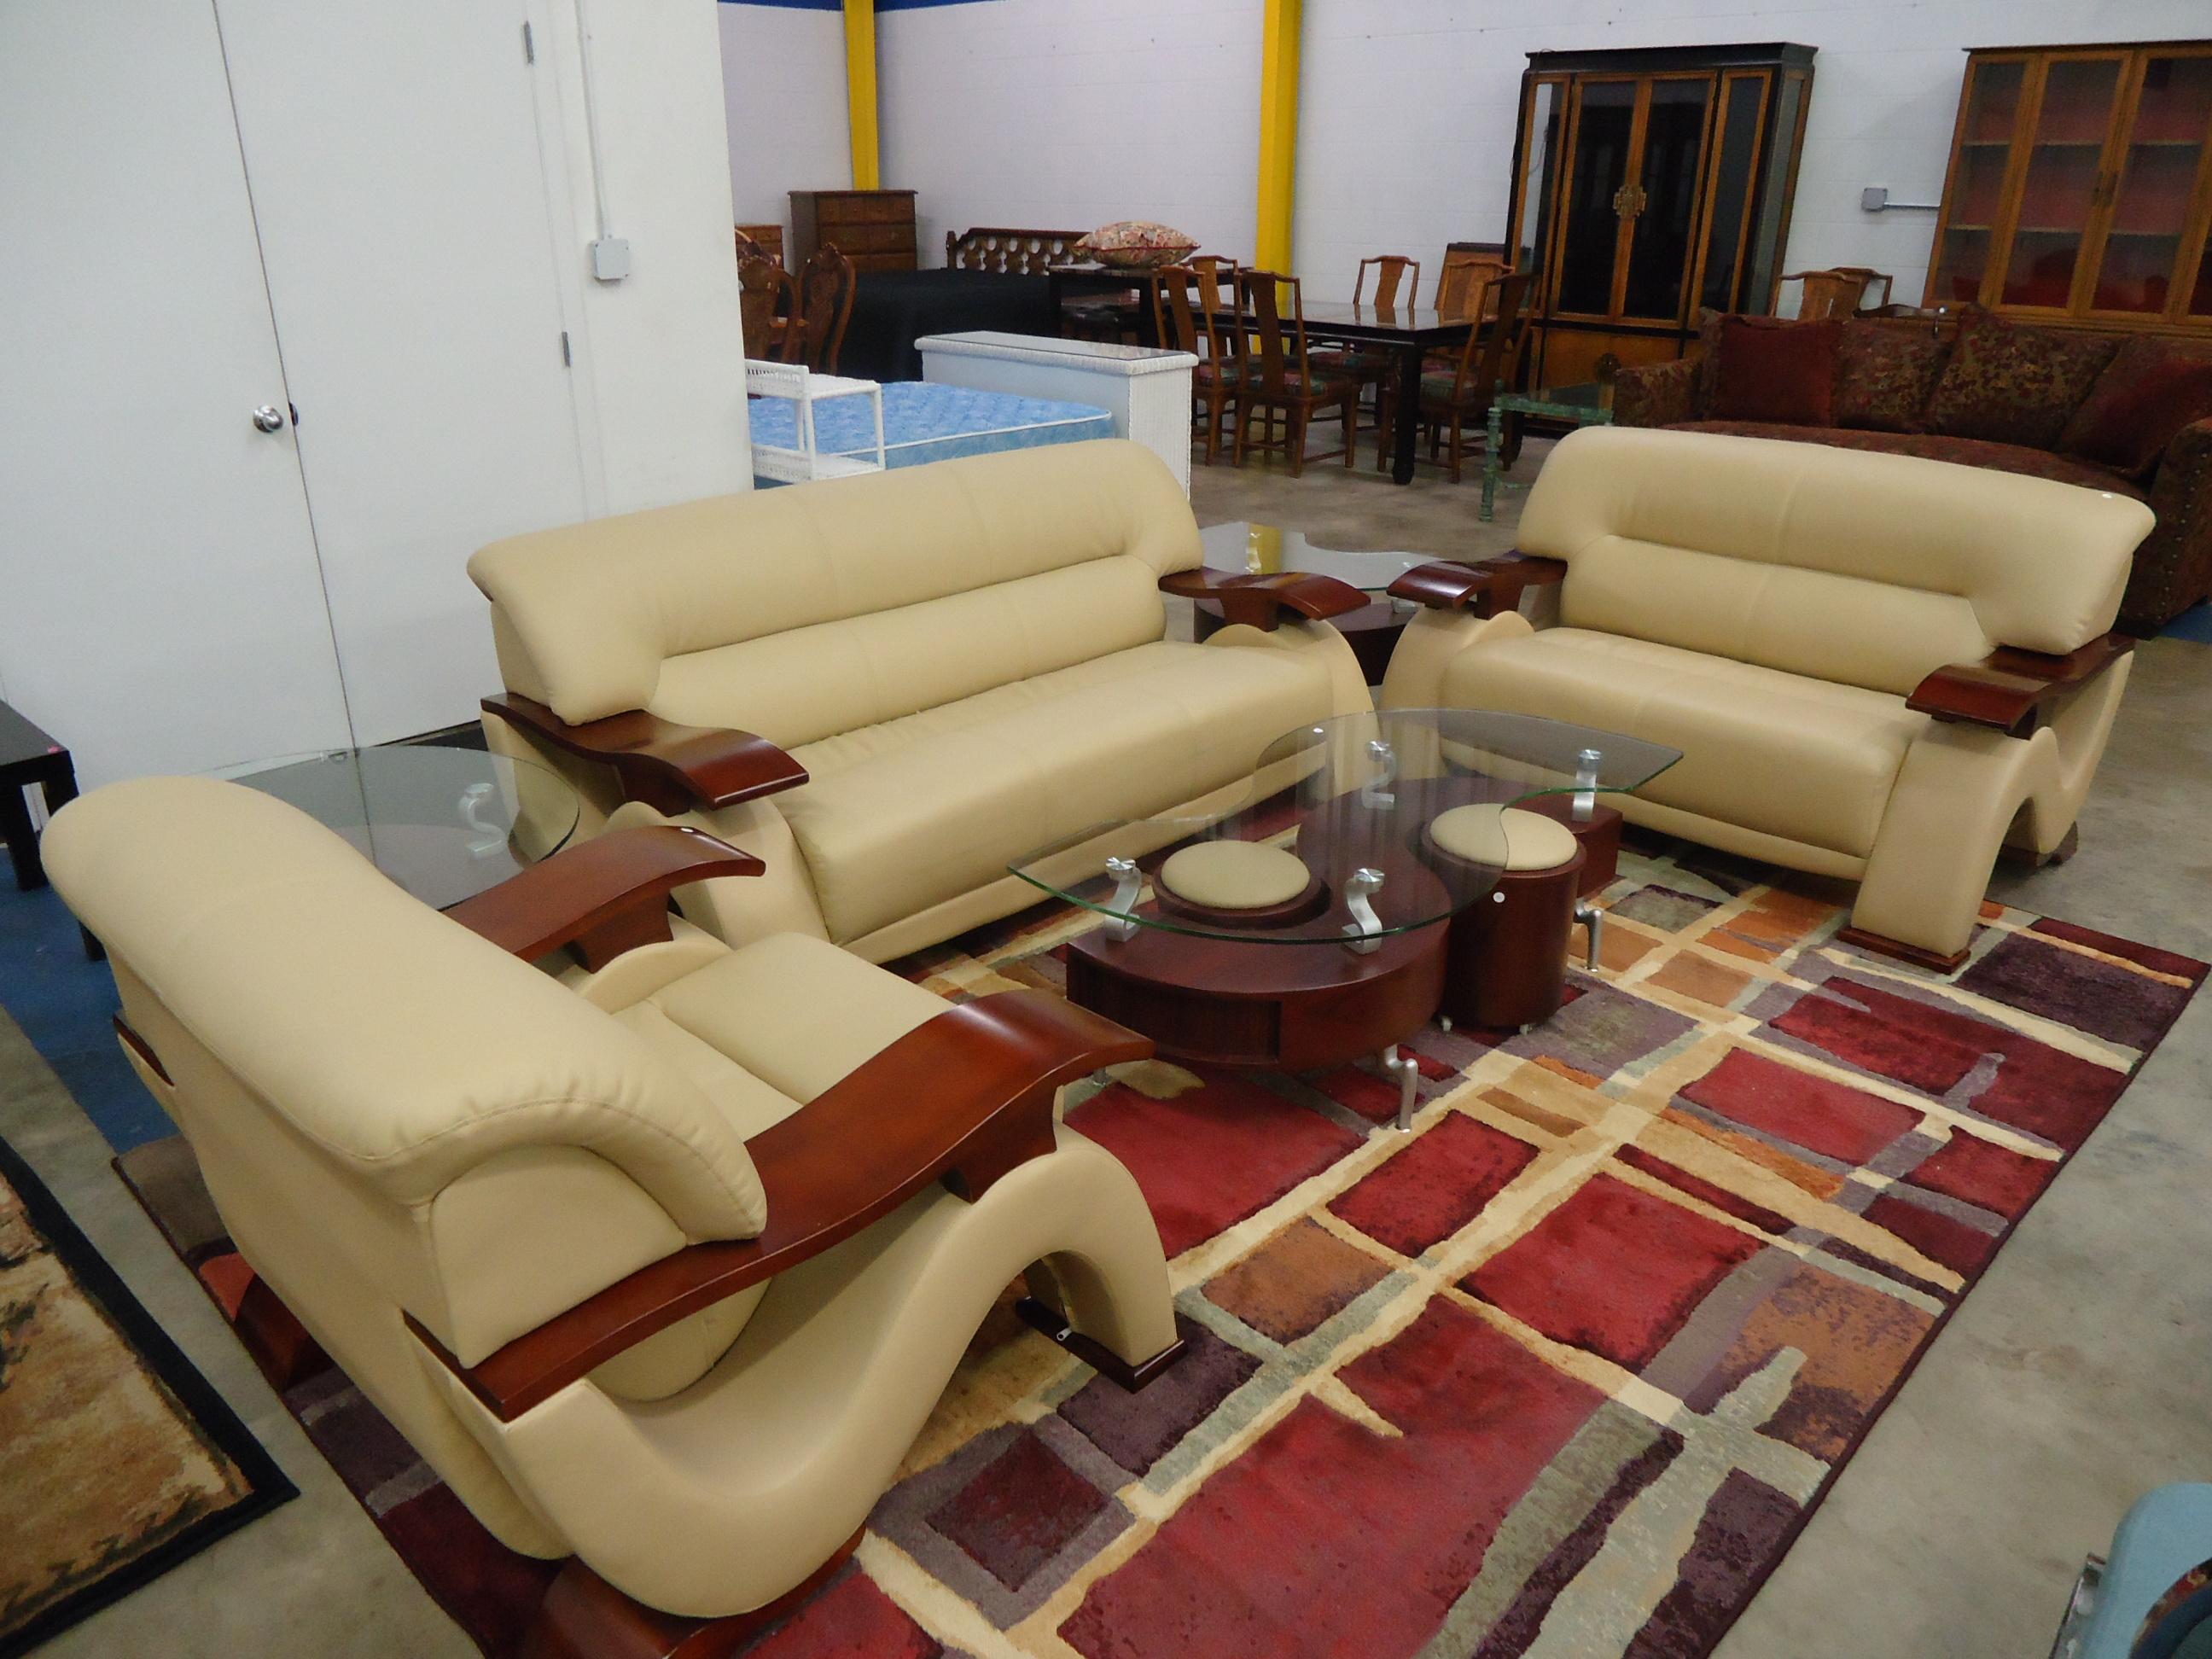 Furniture Auctions Orlando Fl Artegon Marketplace Foodcourt Thursday Jul 13 J World Of Decor